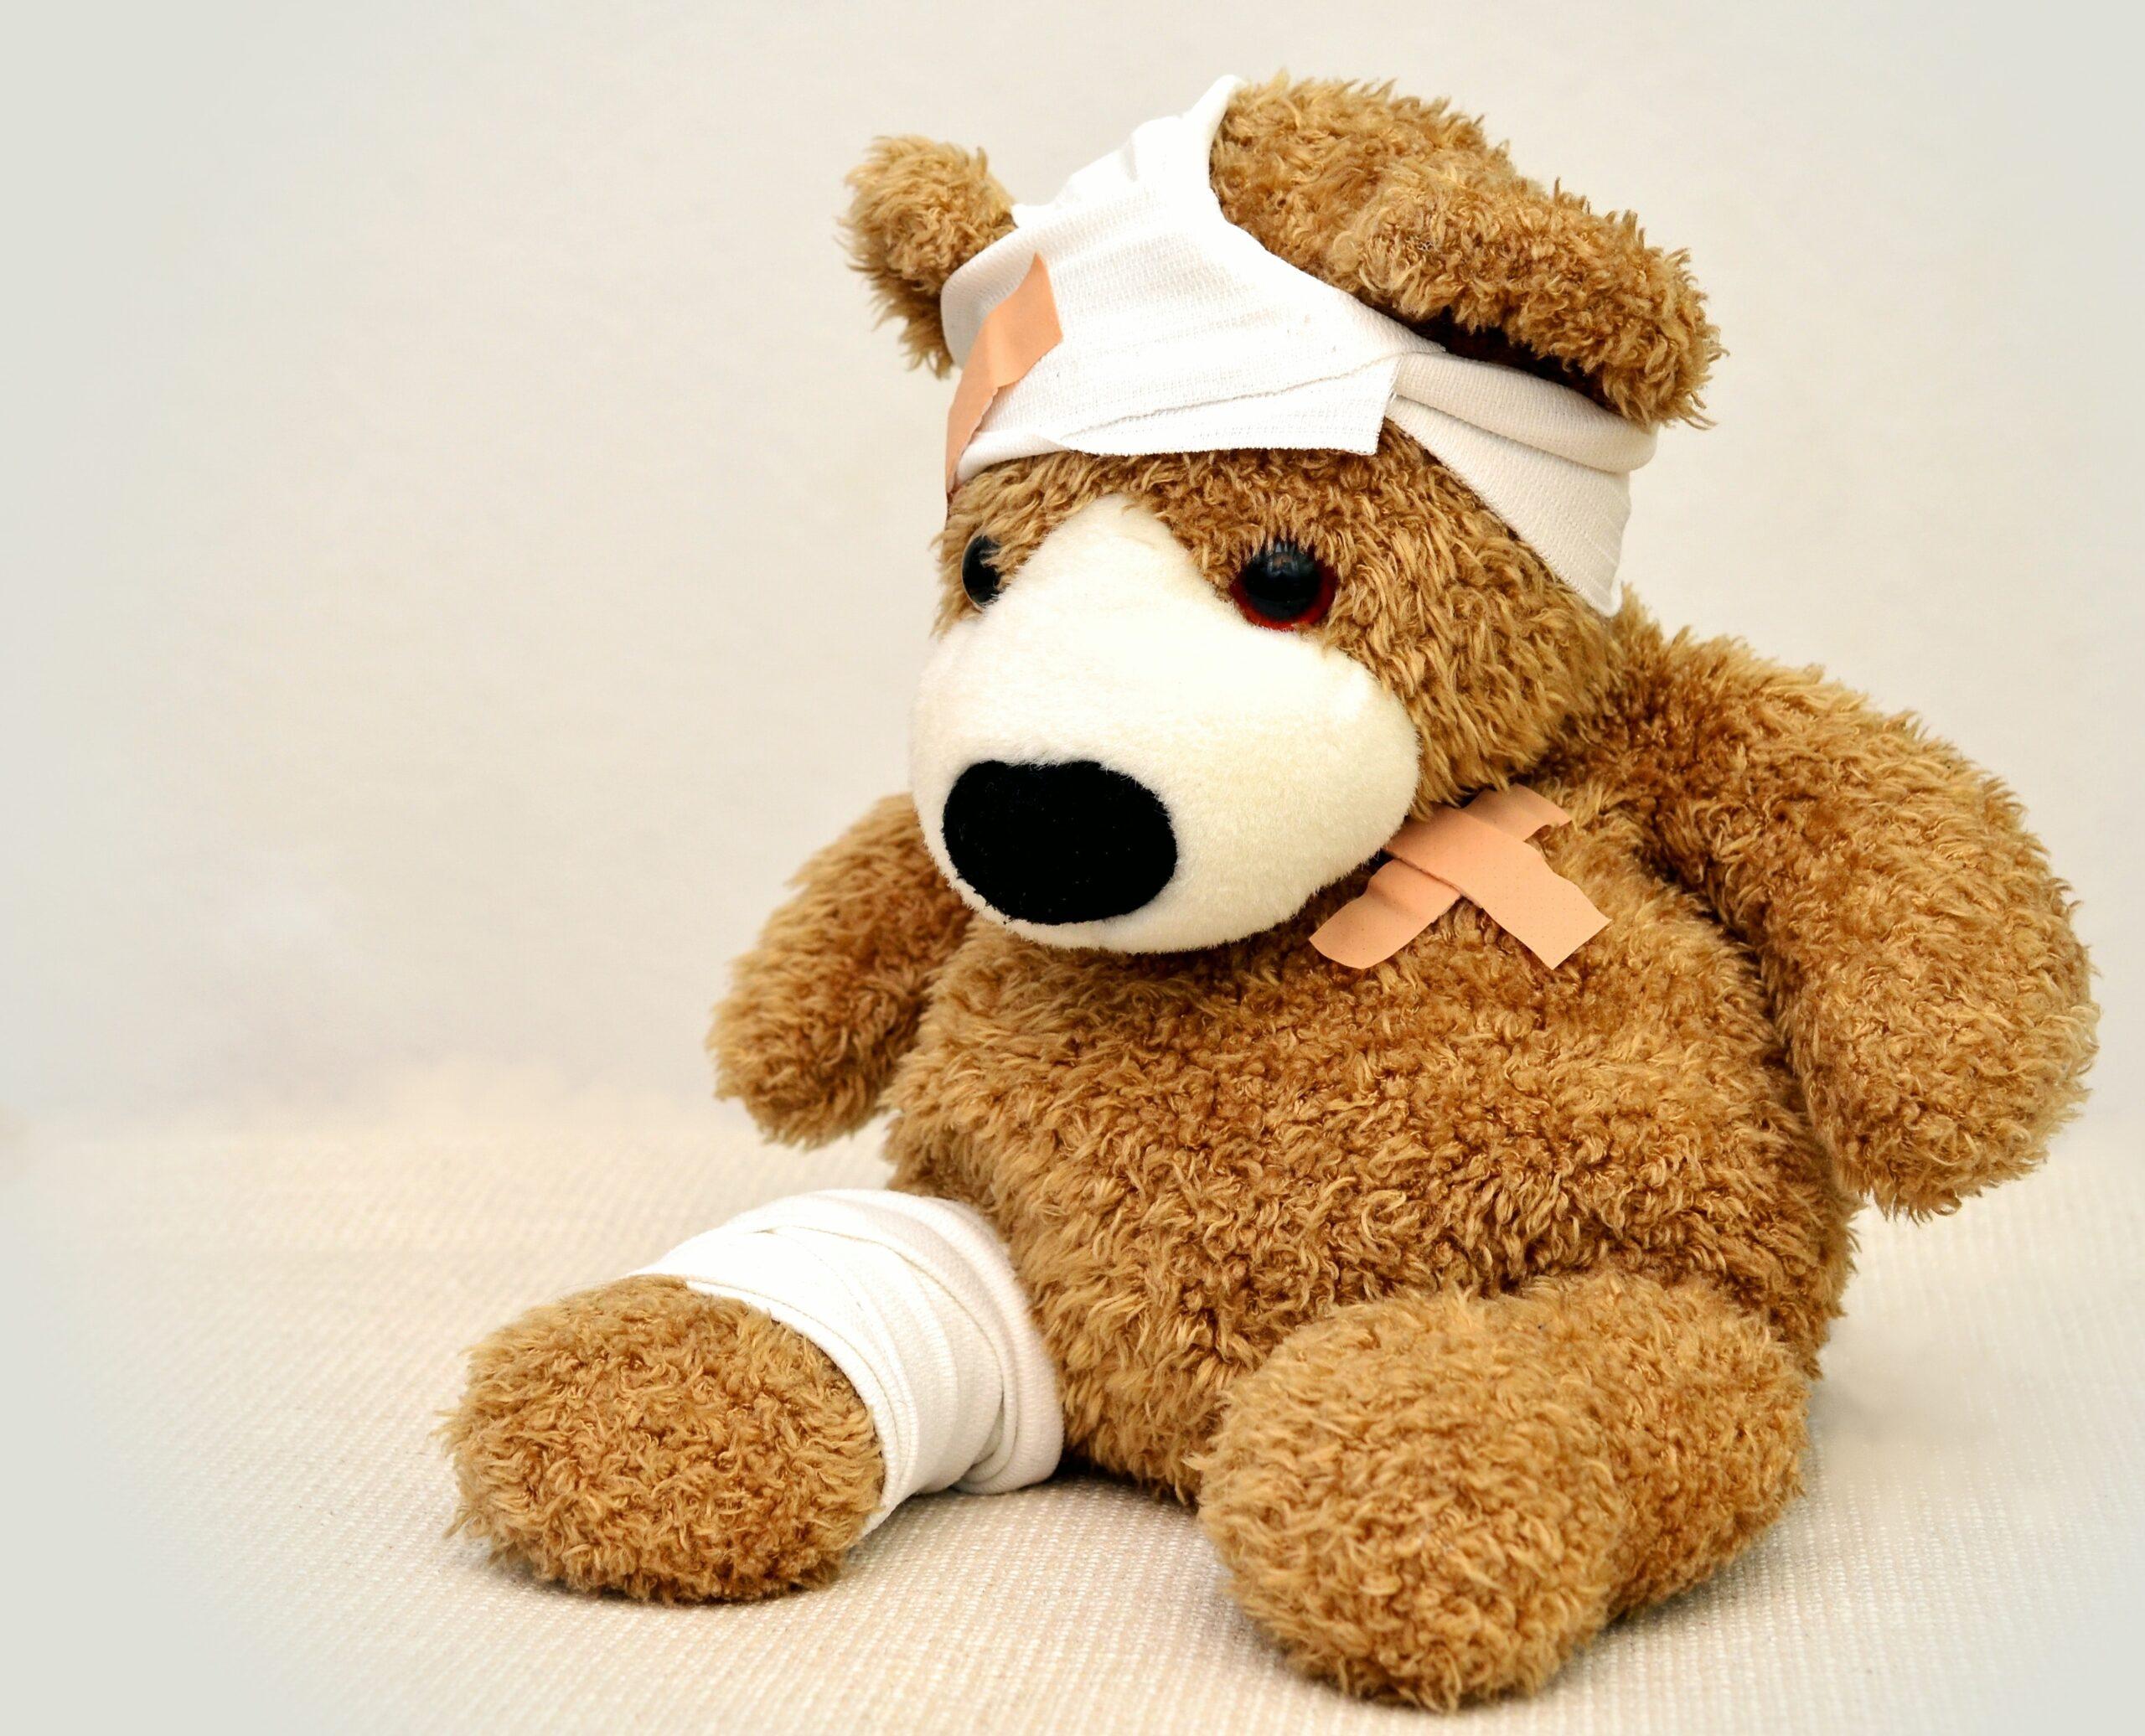 cuddly bear - illness